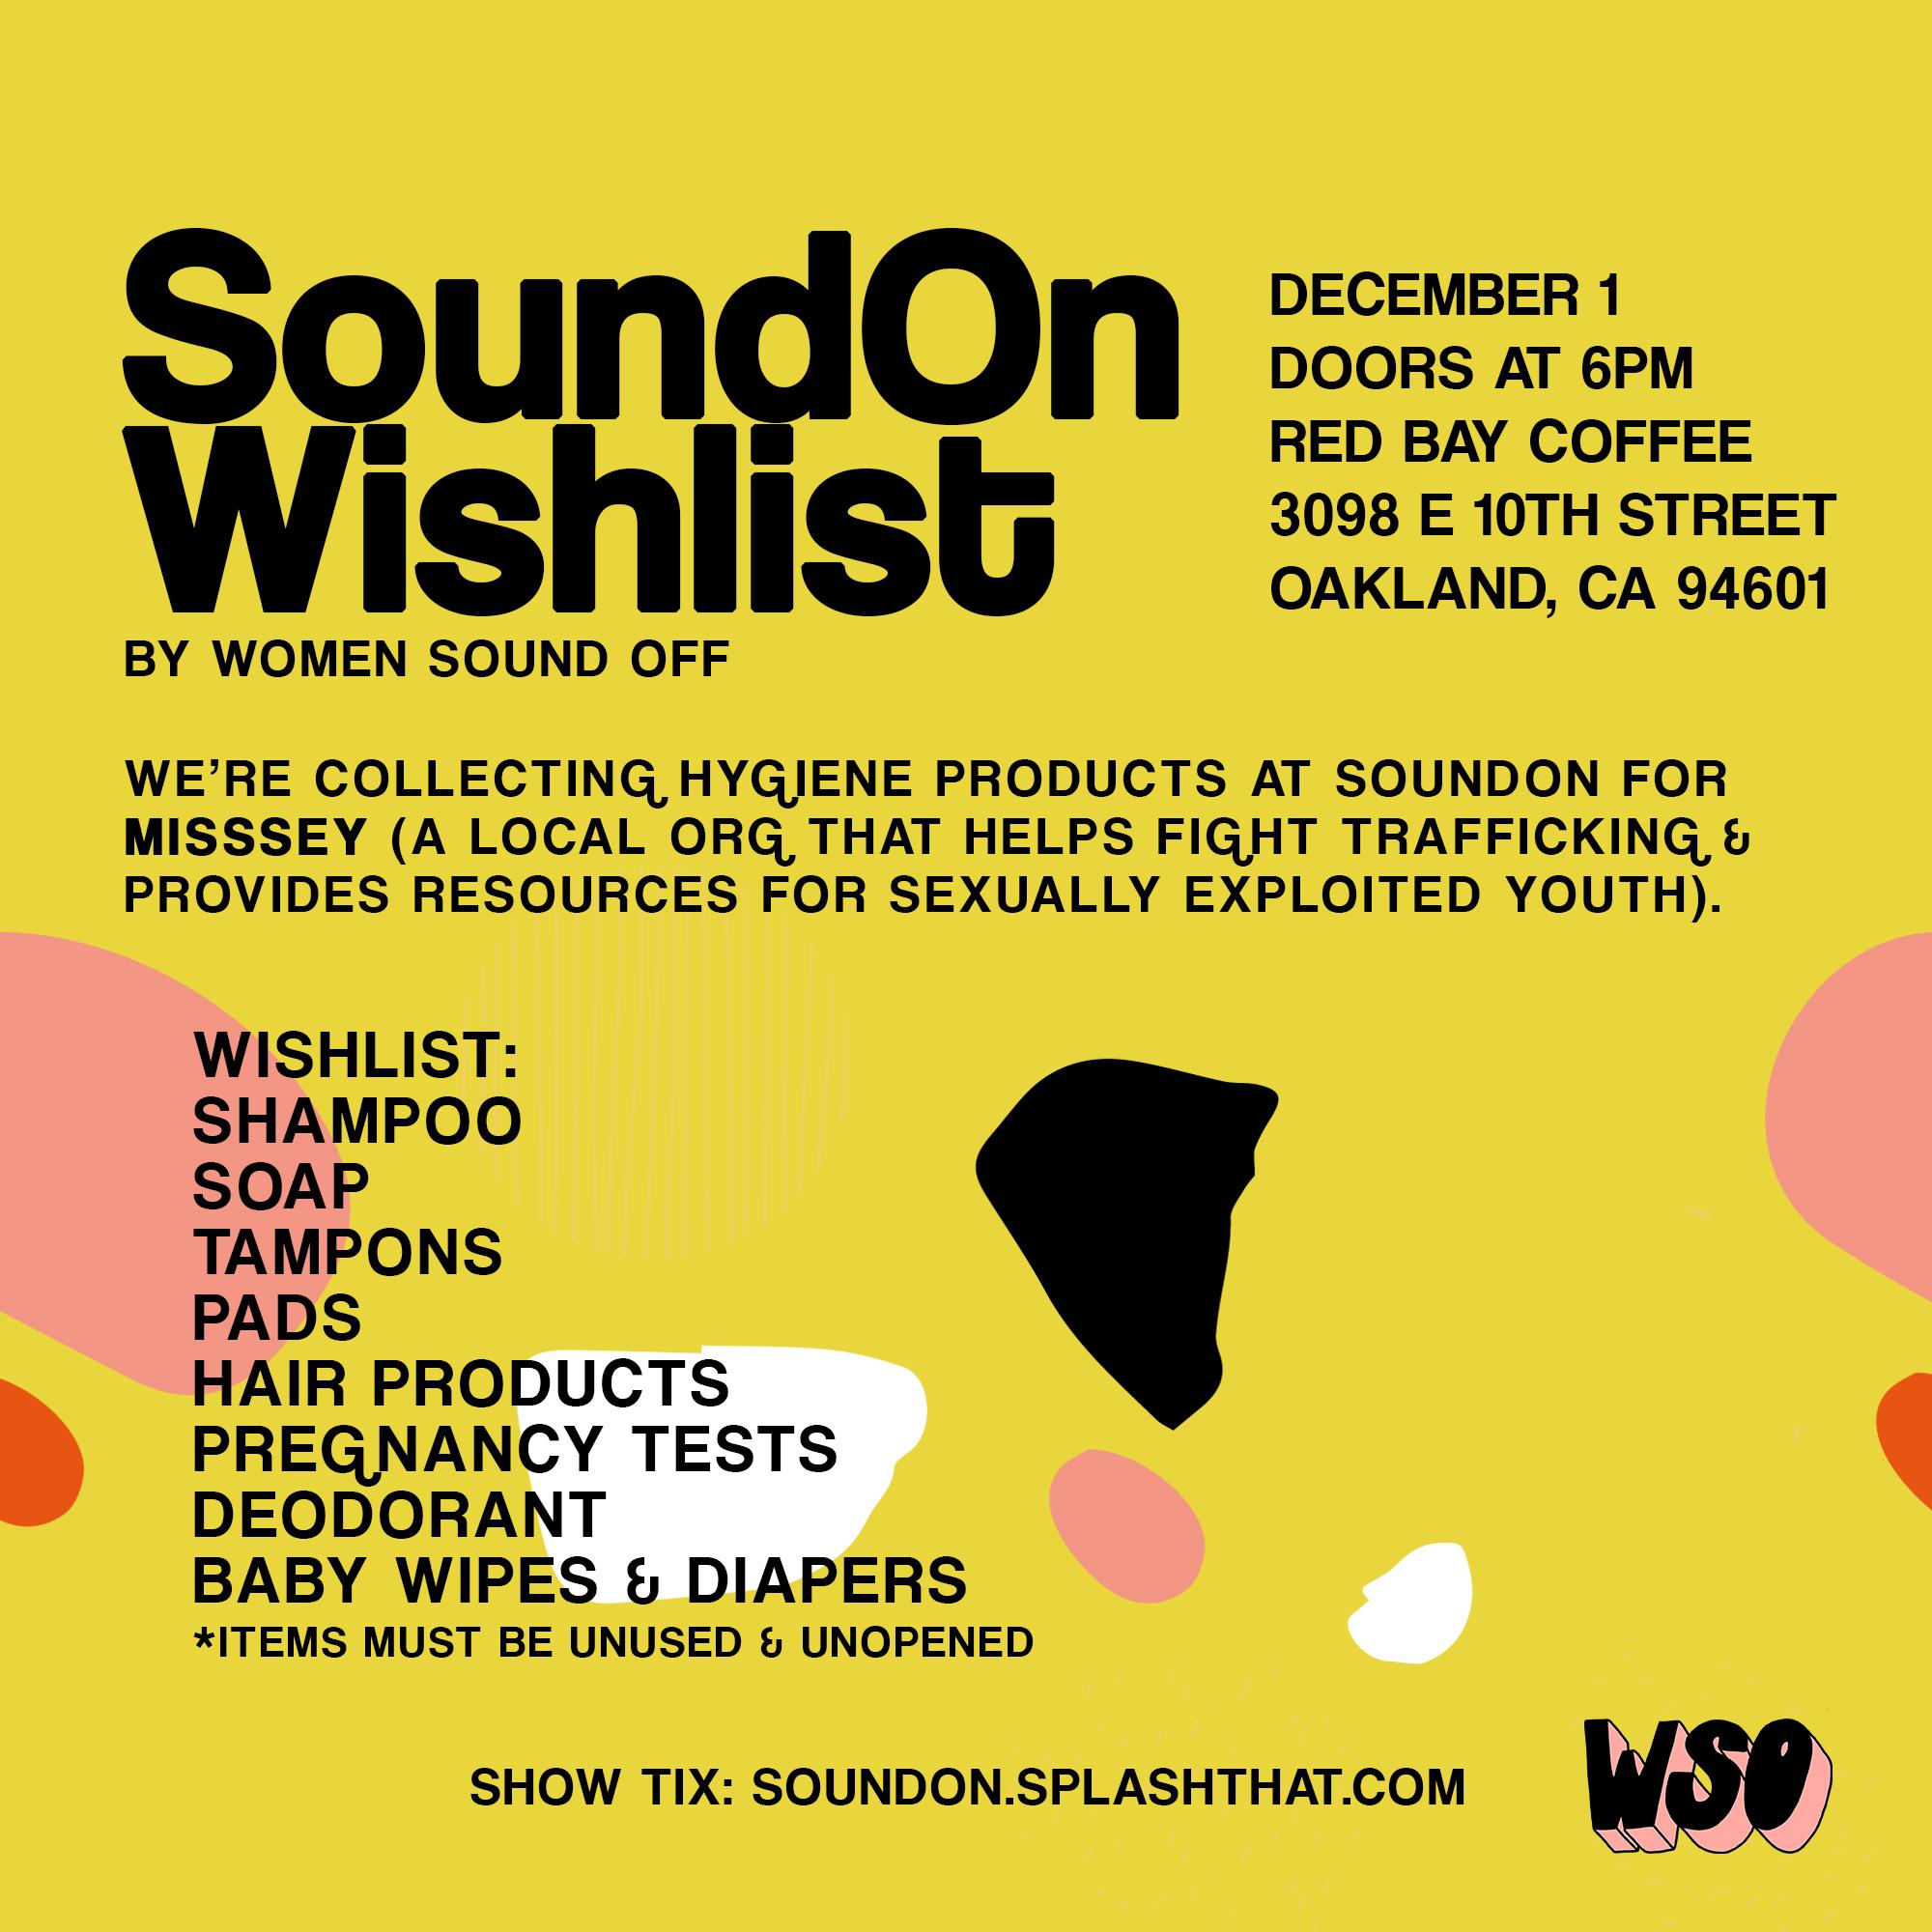 SoundOn_WISHLIST_4.jpg